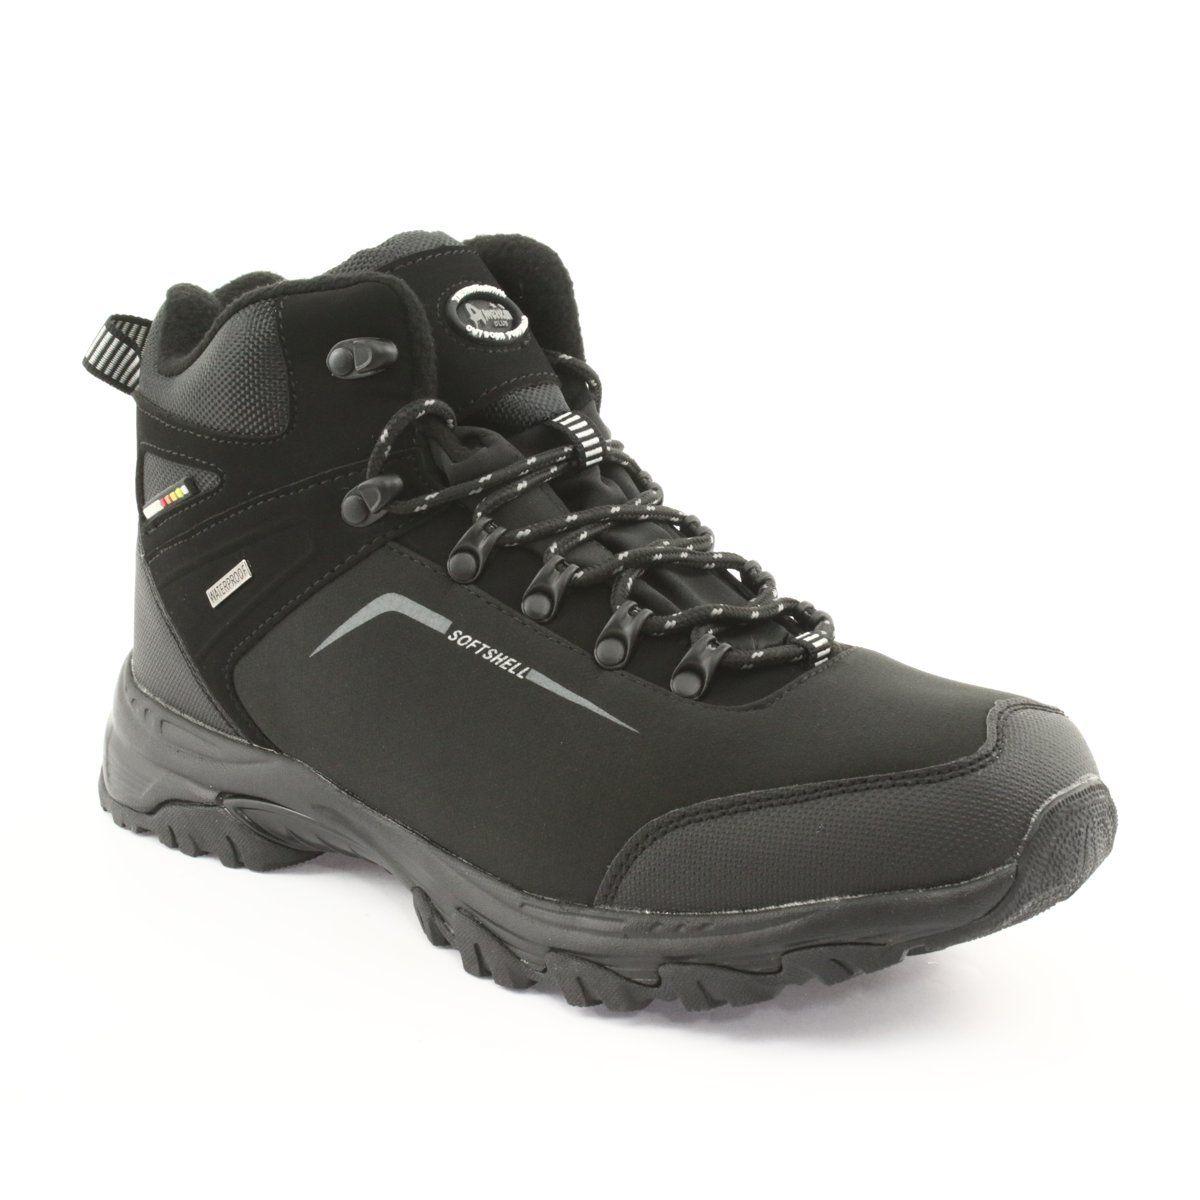 American Club American Trekkingi Buty Zimowe Z Membrana Czarne Hiking Boots Boots Shoes